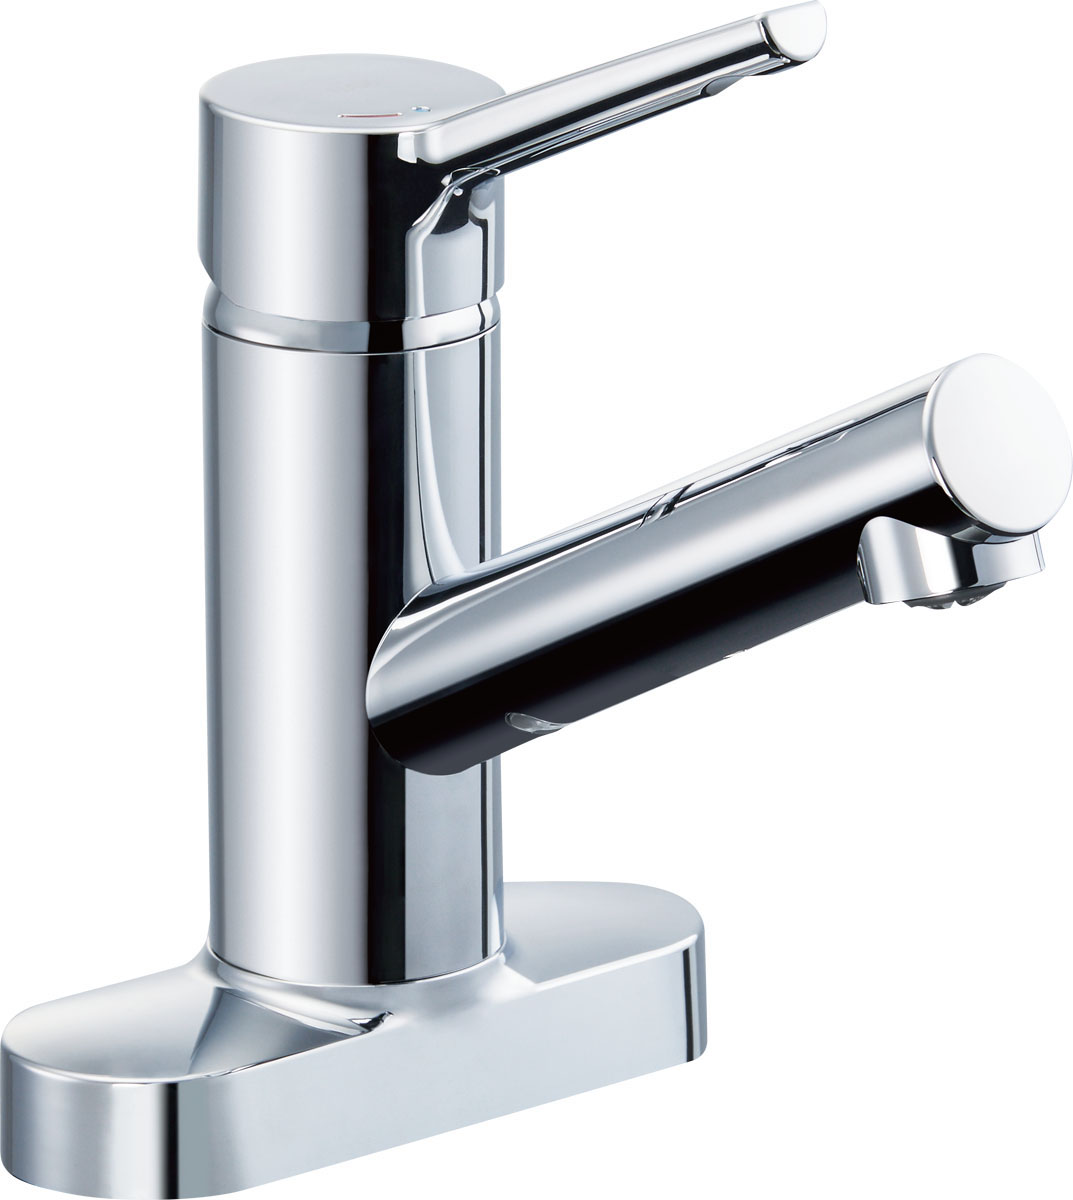 INAX LIXIL キッチン水栓 SF-WM438SY (155) キッチン用水栓金具 ツーホールタイプ クロマーレS (ミニキッチン用) シングルレバー混合水栓 [イナックス・リクシル]